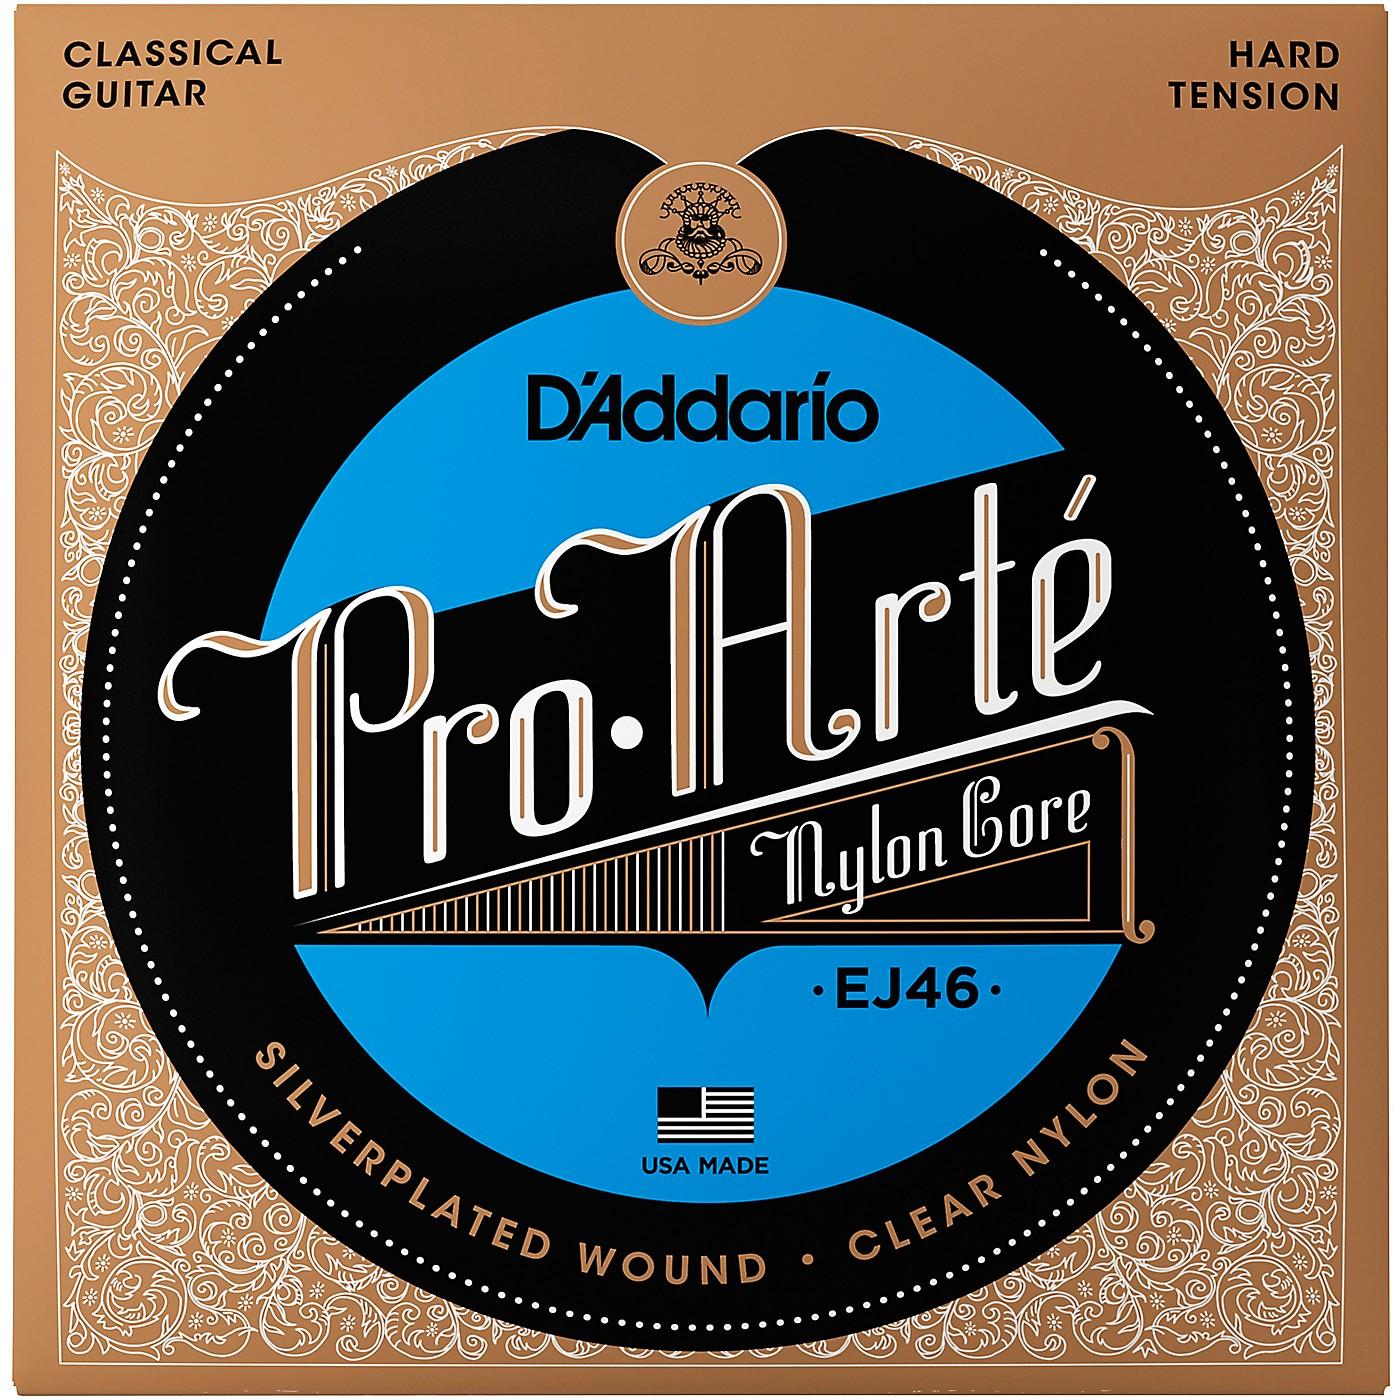 D'Addario EJ46 Pro-Arte Hard Tension Classical Guitar Strings thumbnail